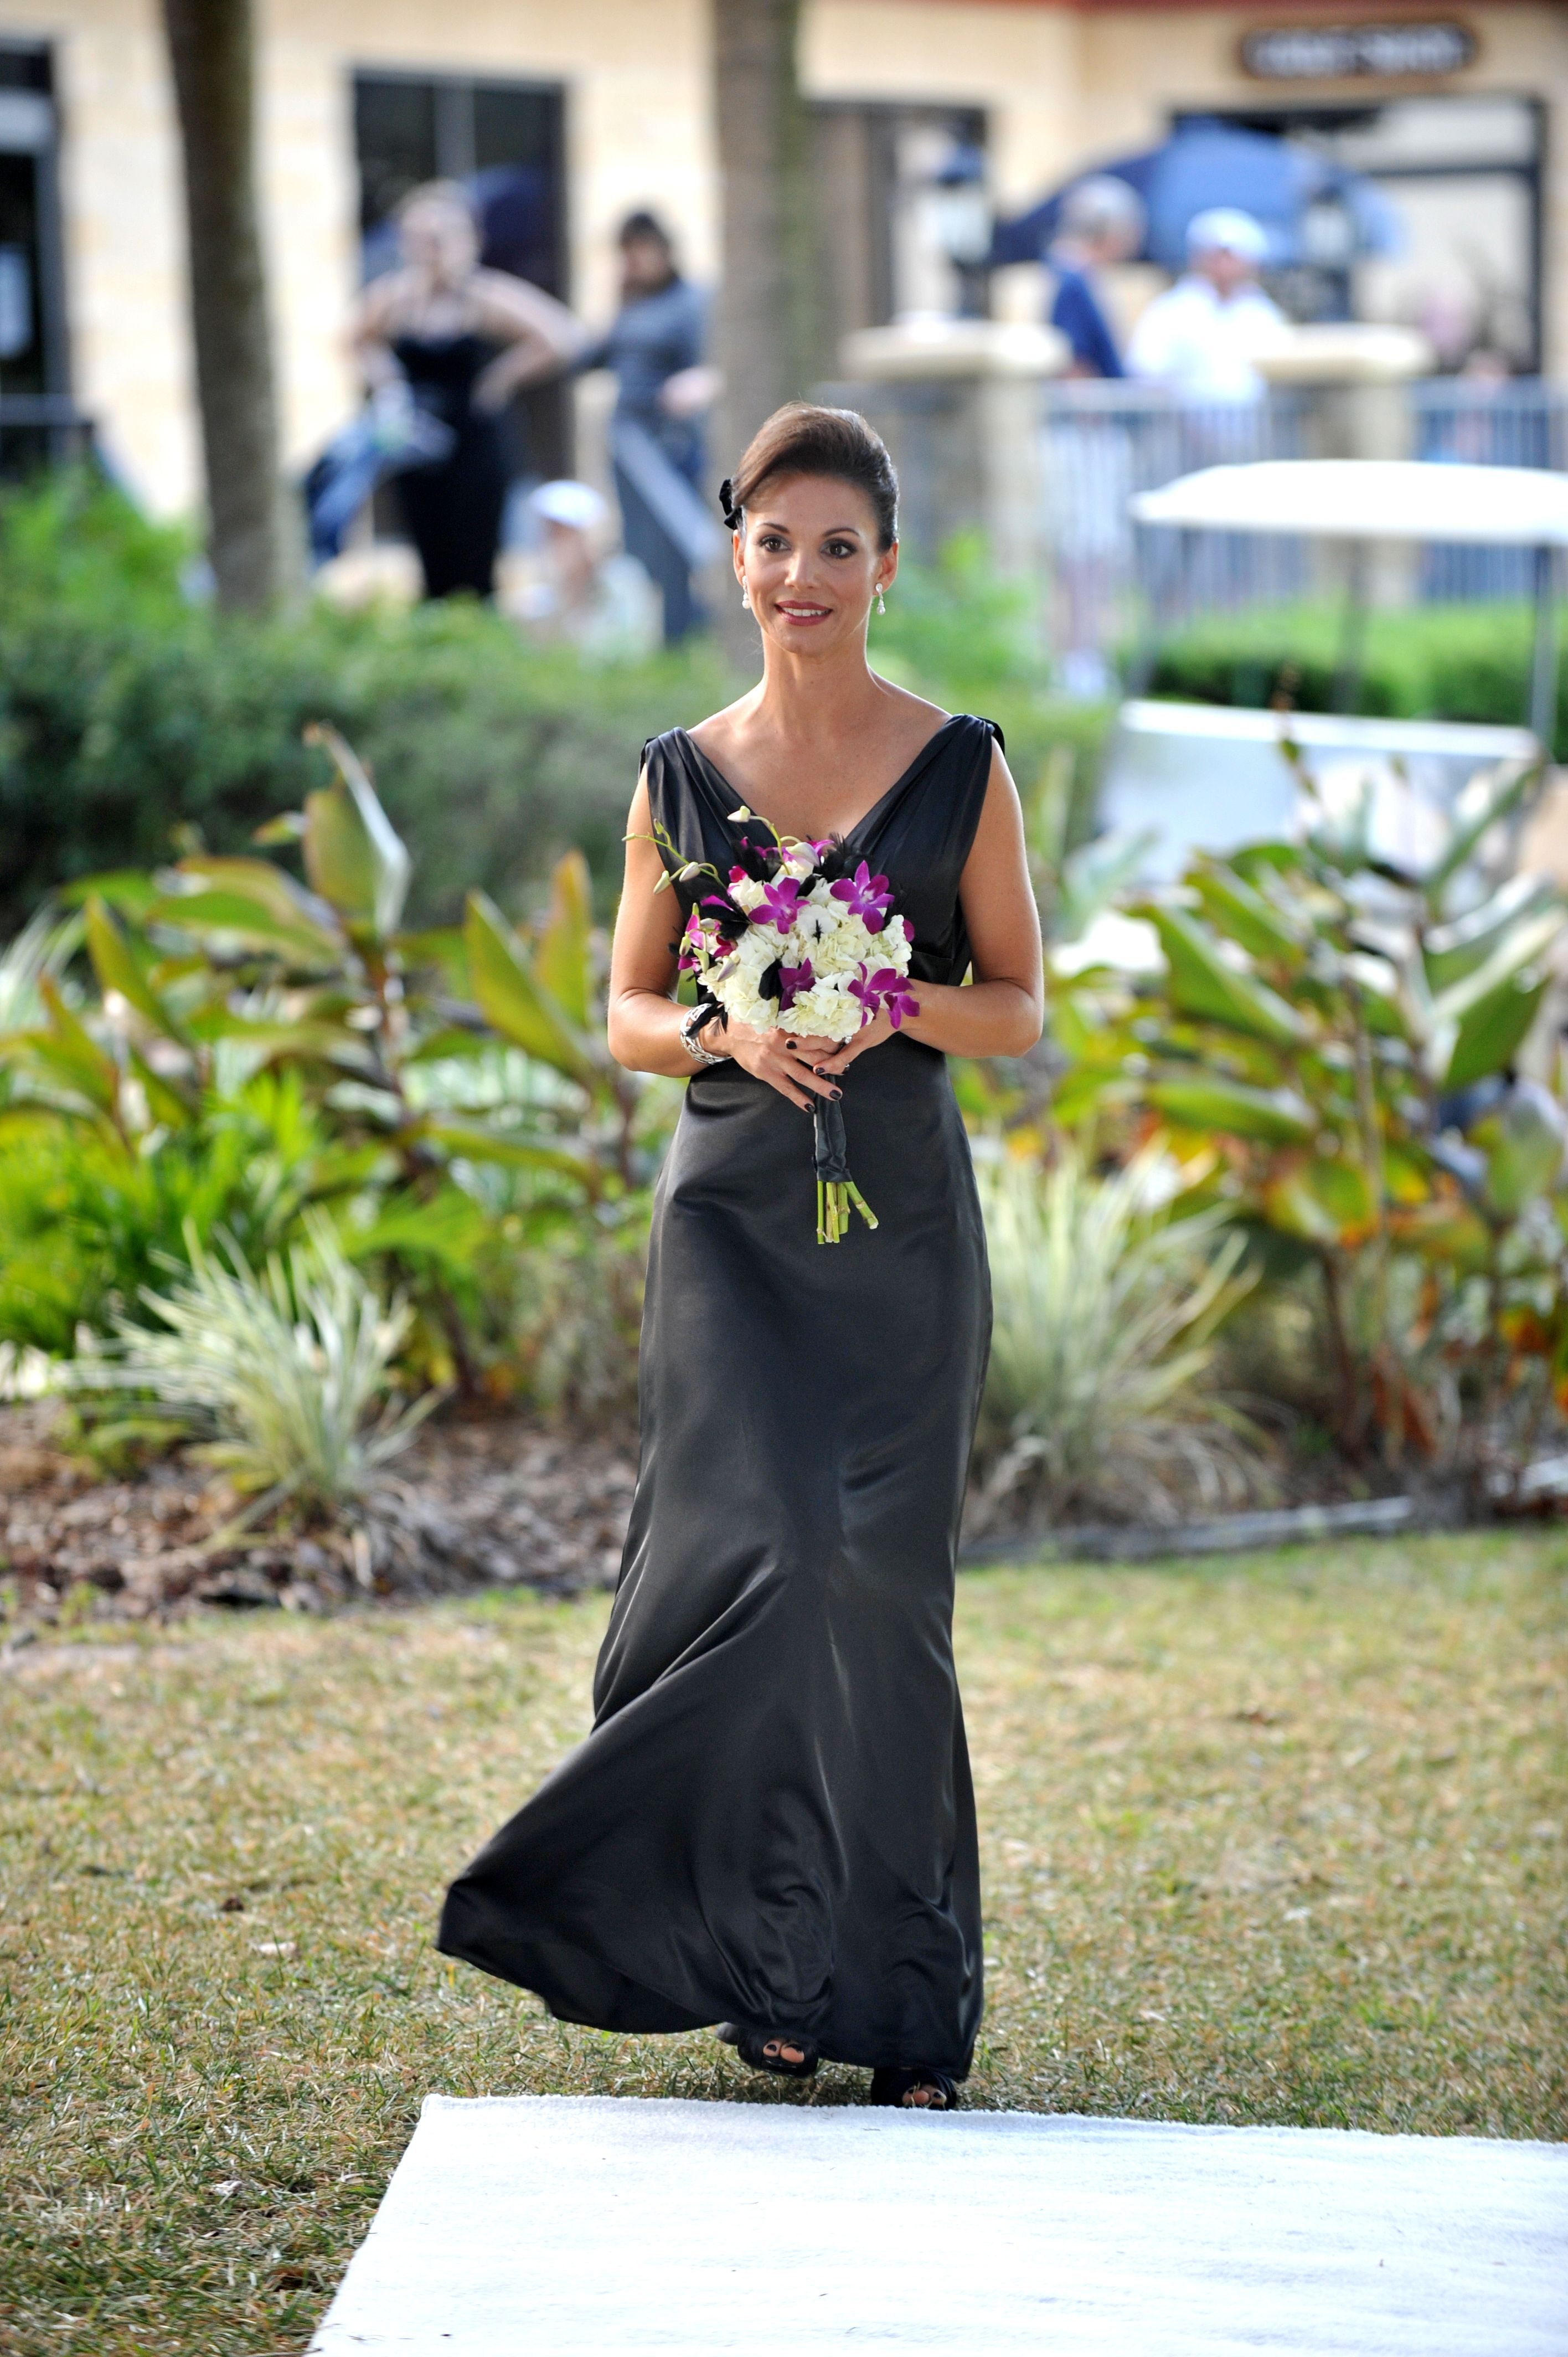 Black Bridesmaid dress - satin, v-neck, open drooping back.